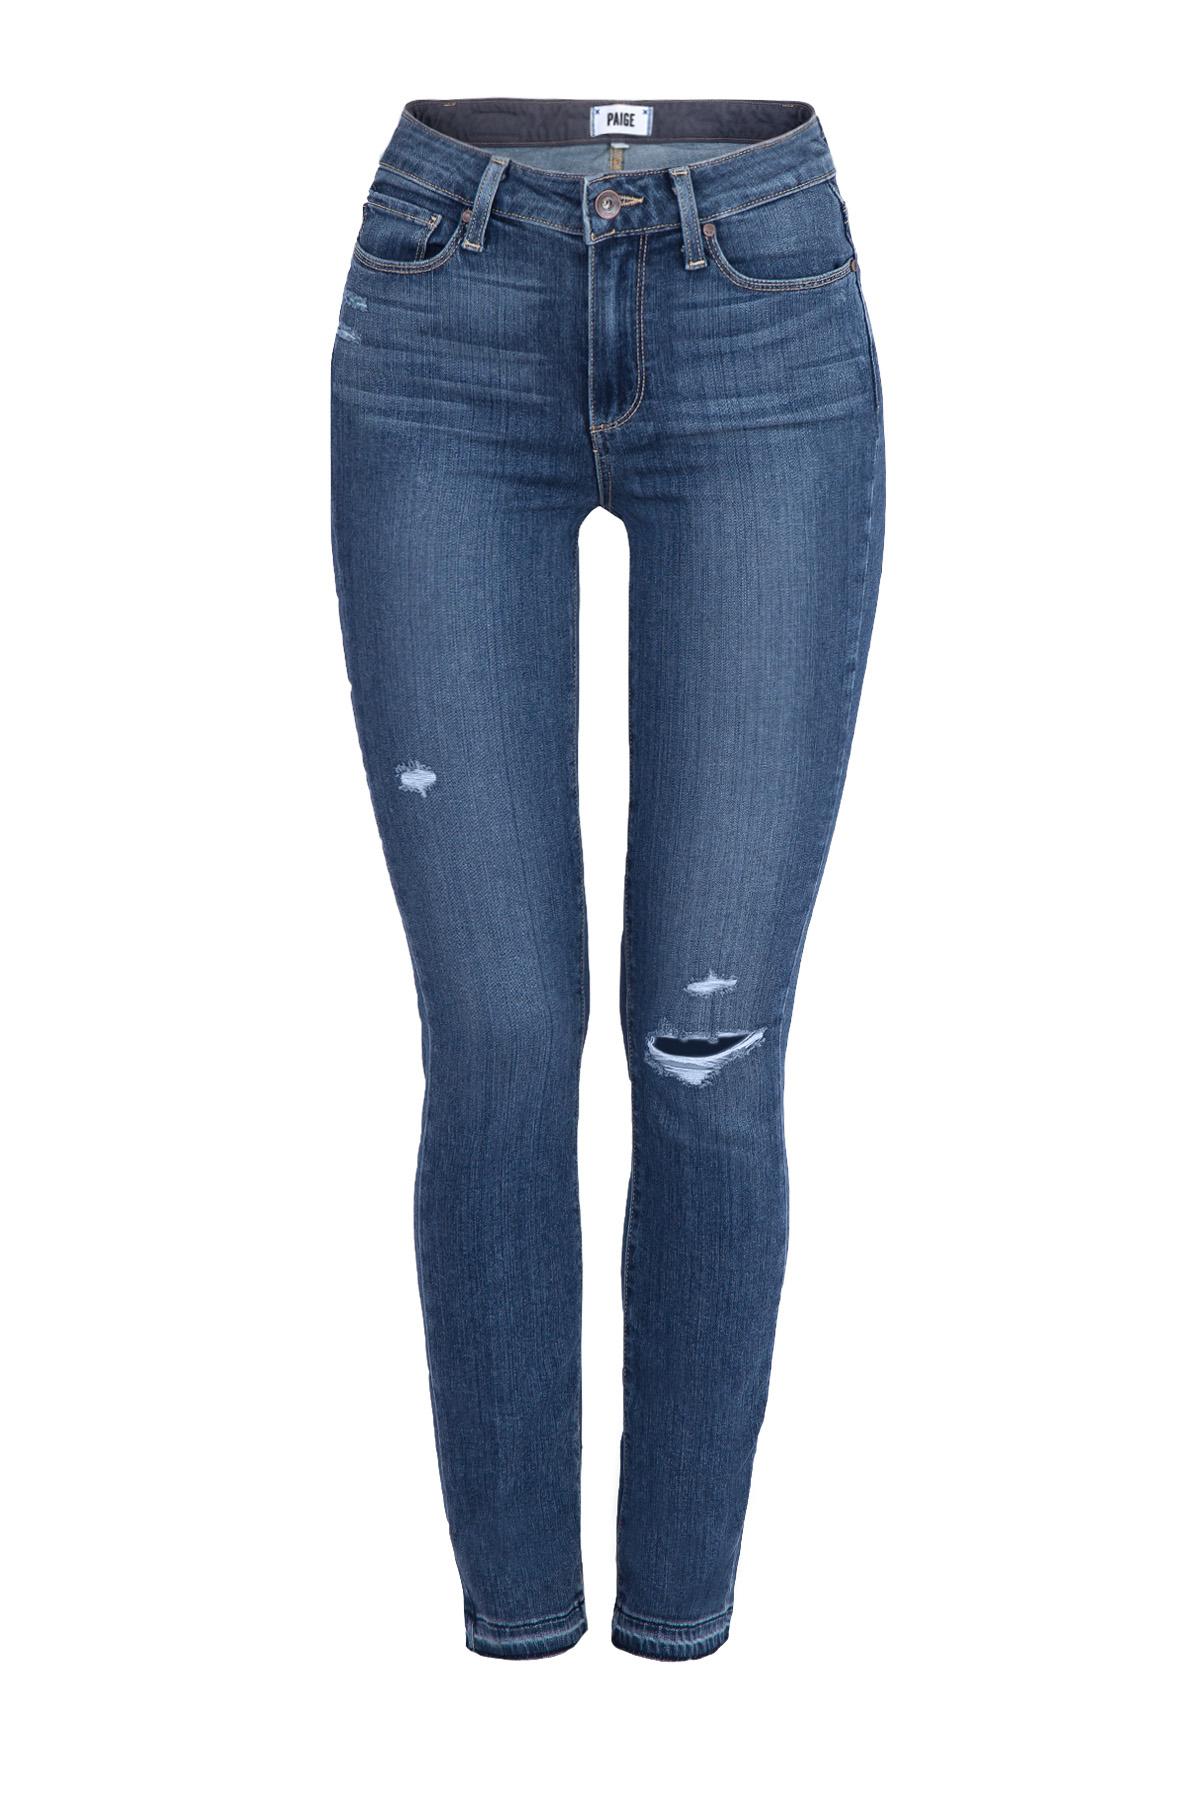 джинсыДжинсы<br><br>Материал: rayon 58% ,  хлопок 21% ,  полиэстер 20% ,  спандекс 1%;